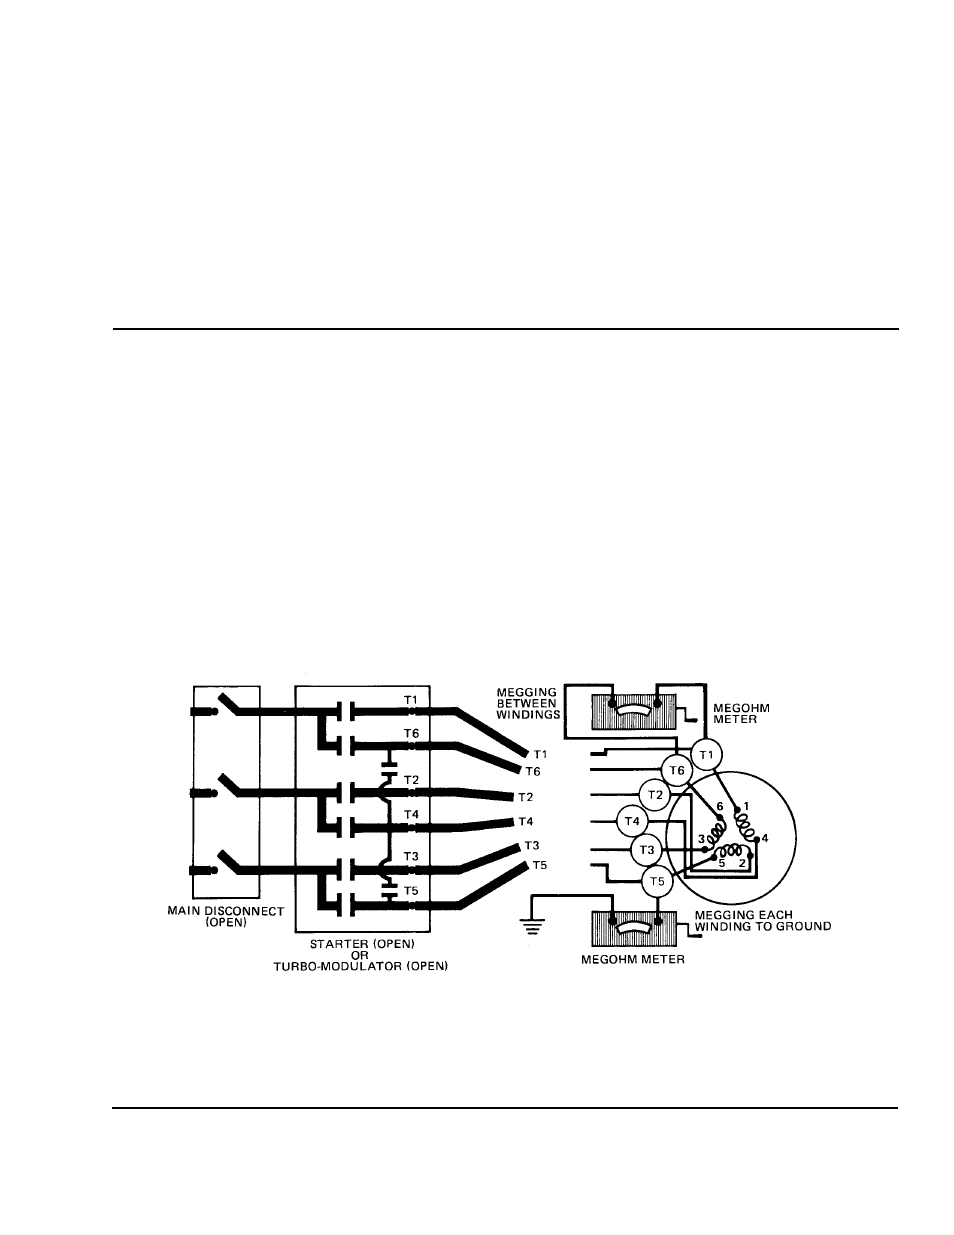 york millennium schematics y14 megging a motor - impremedia.net